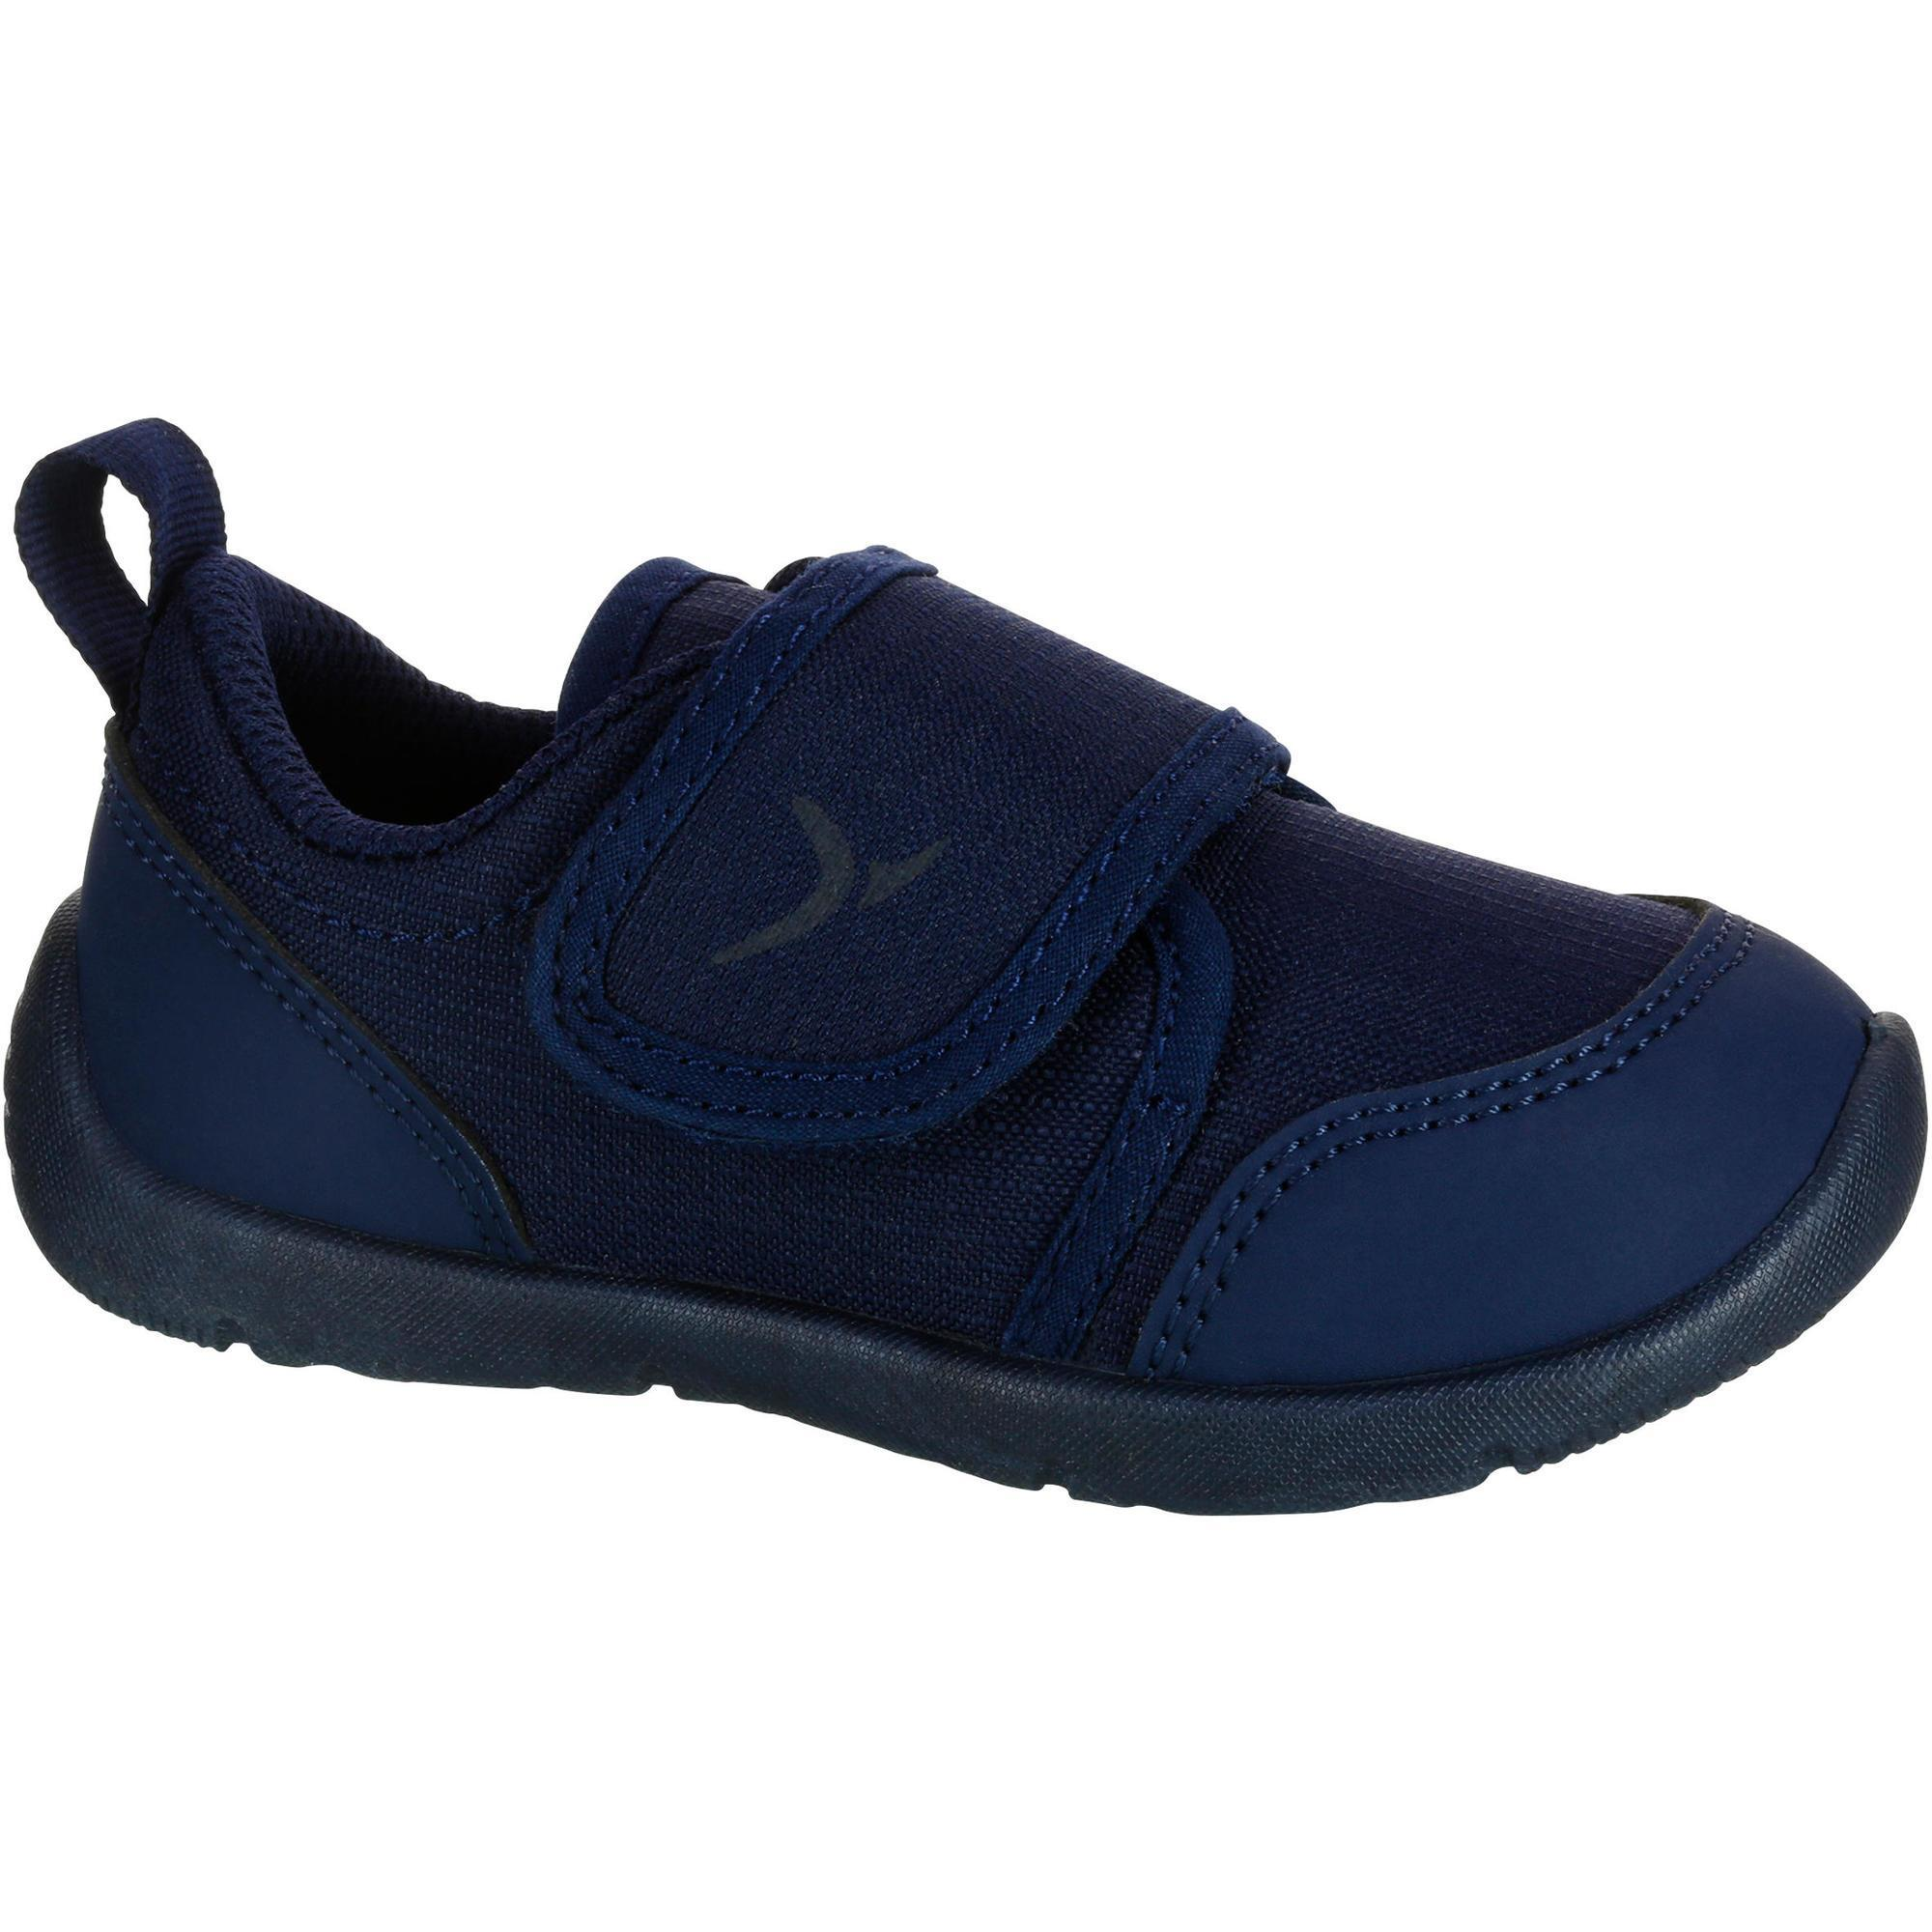 Baby,Kinder,Jungen,Kinder Turnschuhe 100 I Learn First marineblau | 03608419322170